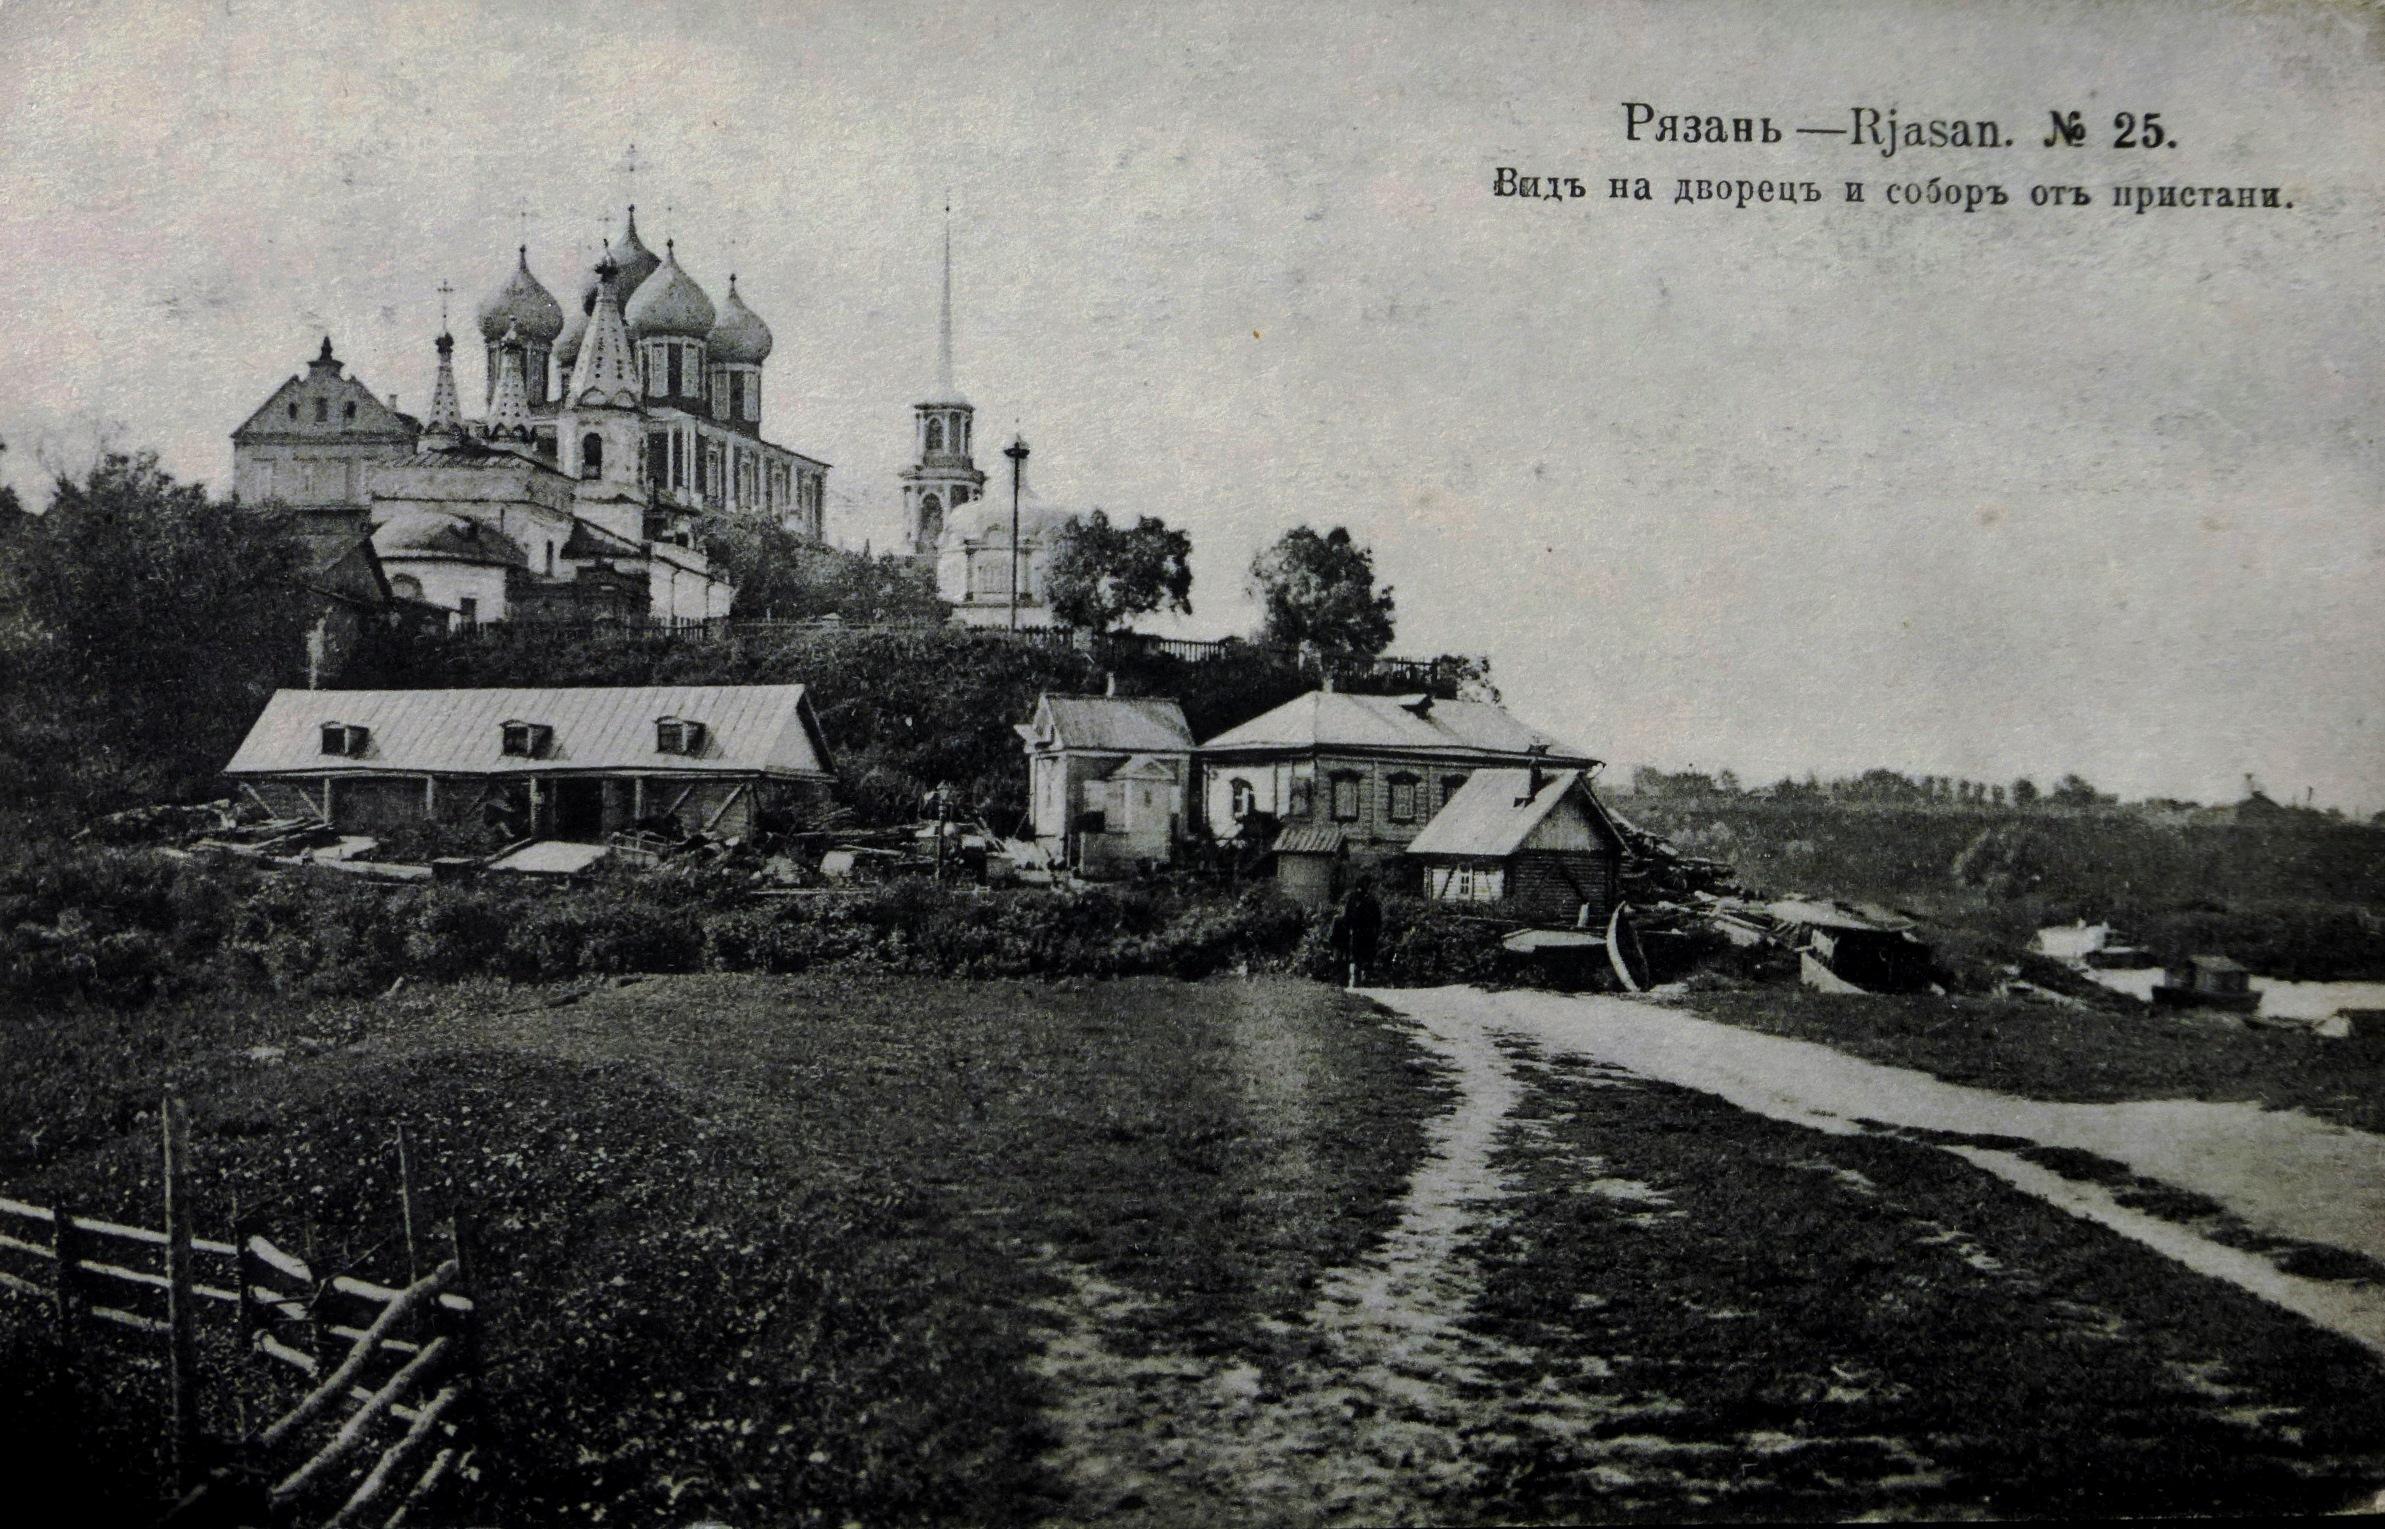 Вид на дворец и собор от пристани